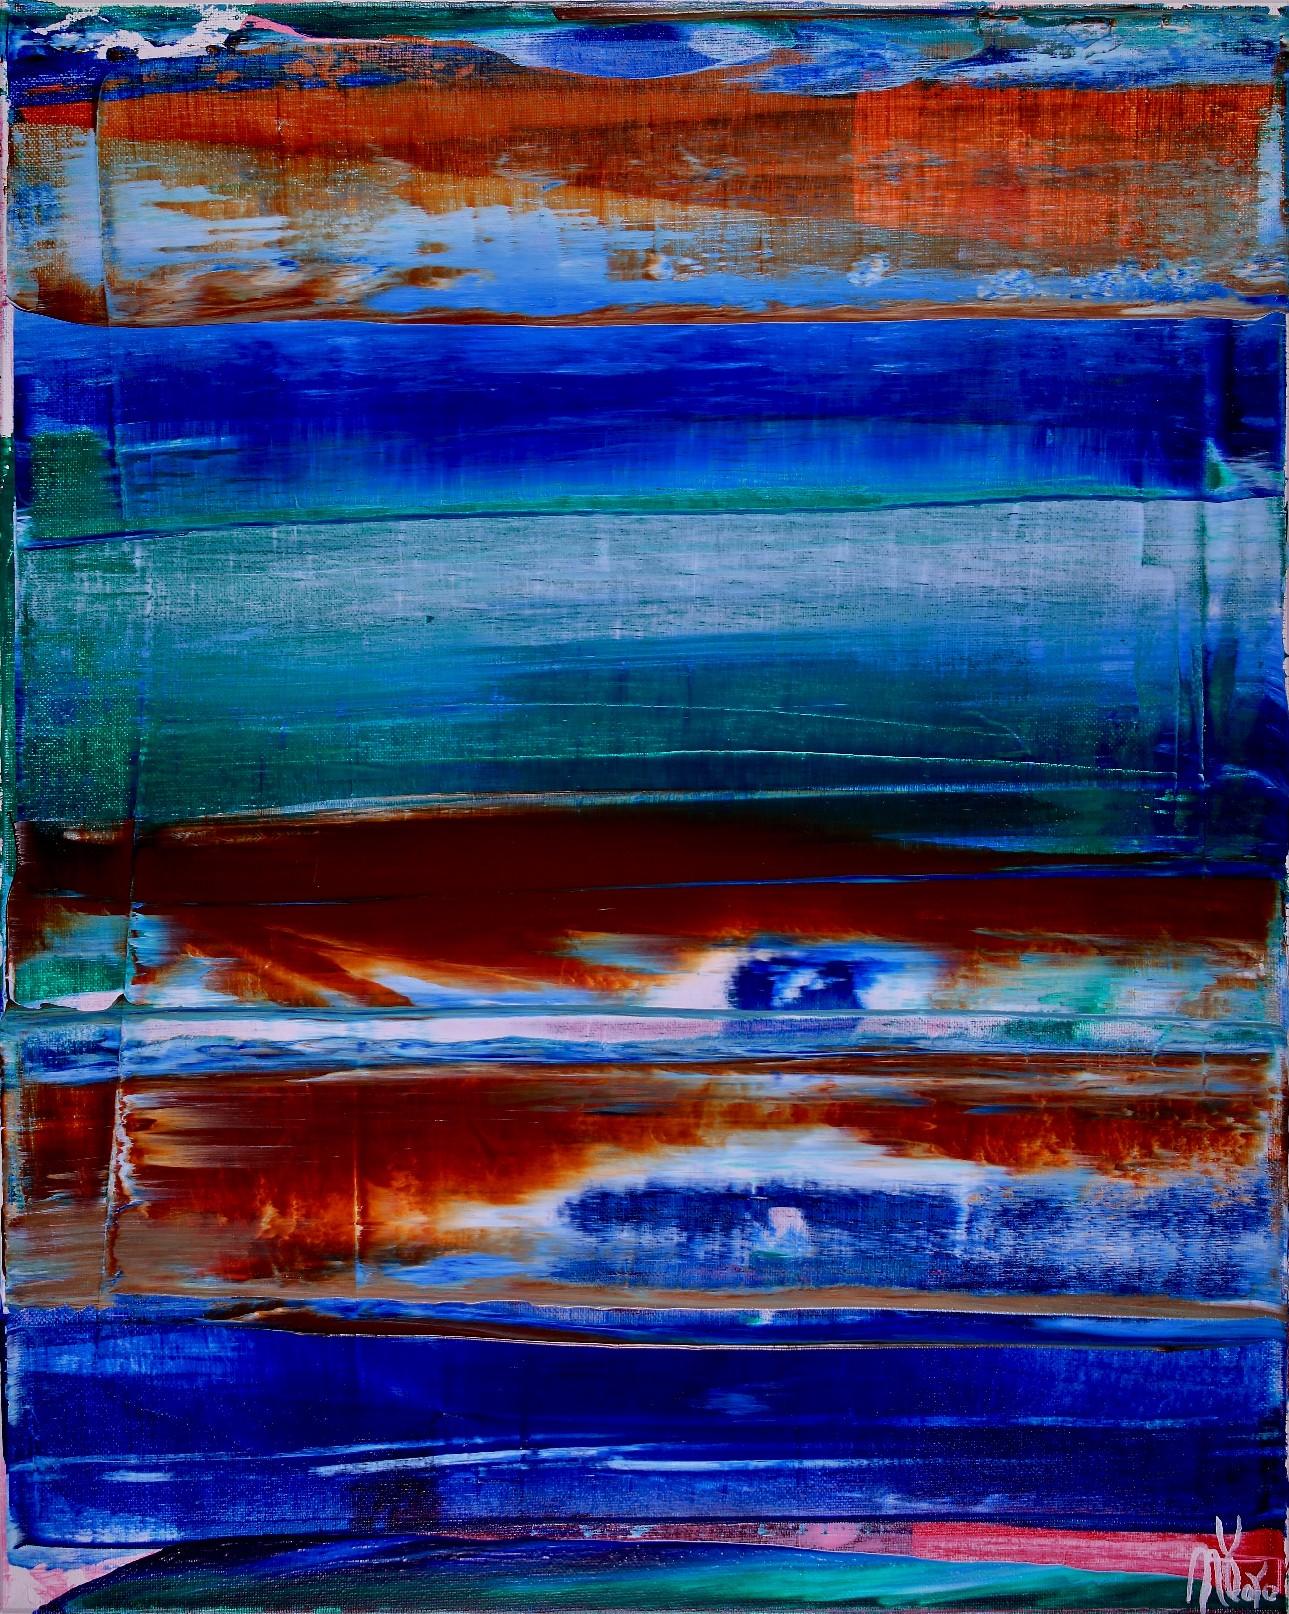 Reflejo infinito (Azulejos) by Nestor Toro 2019